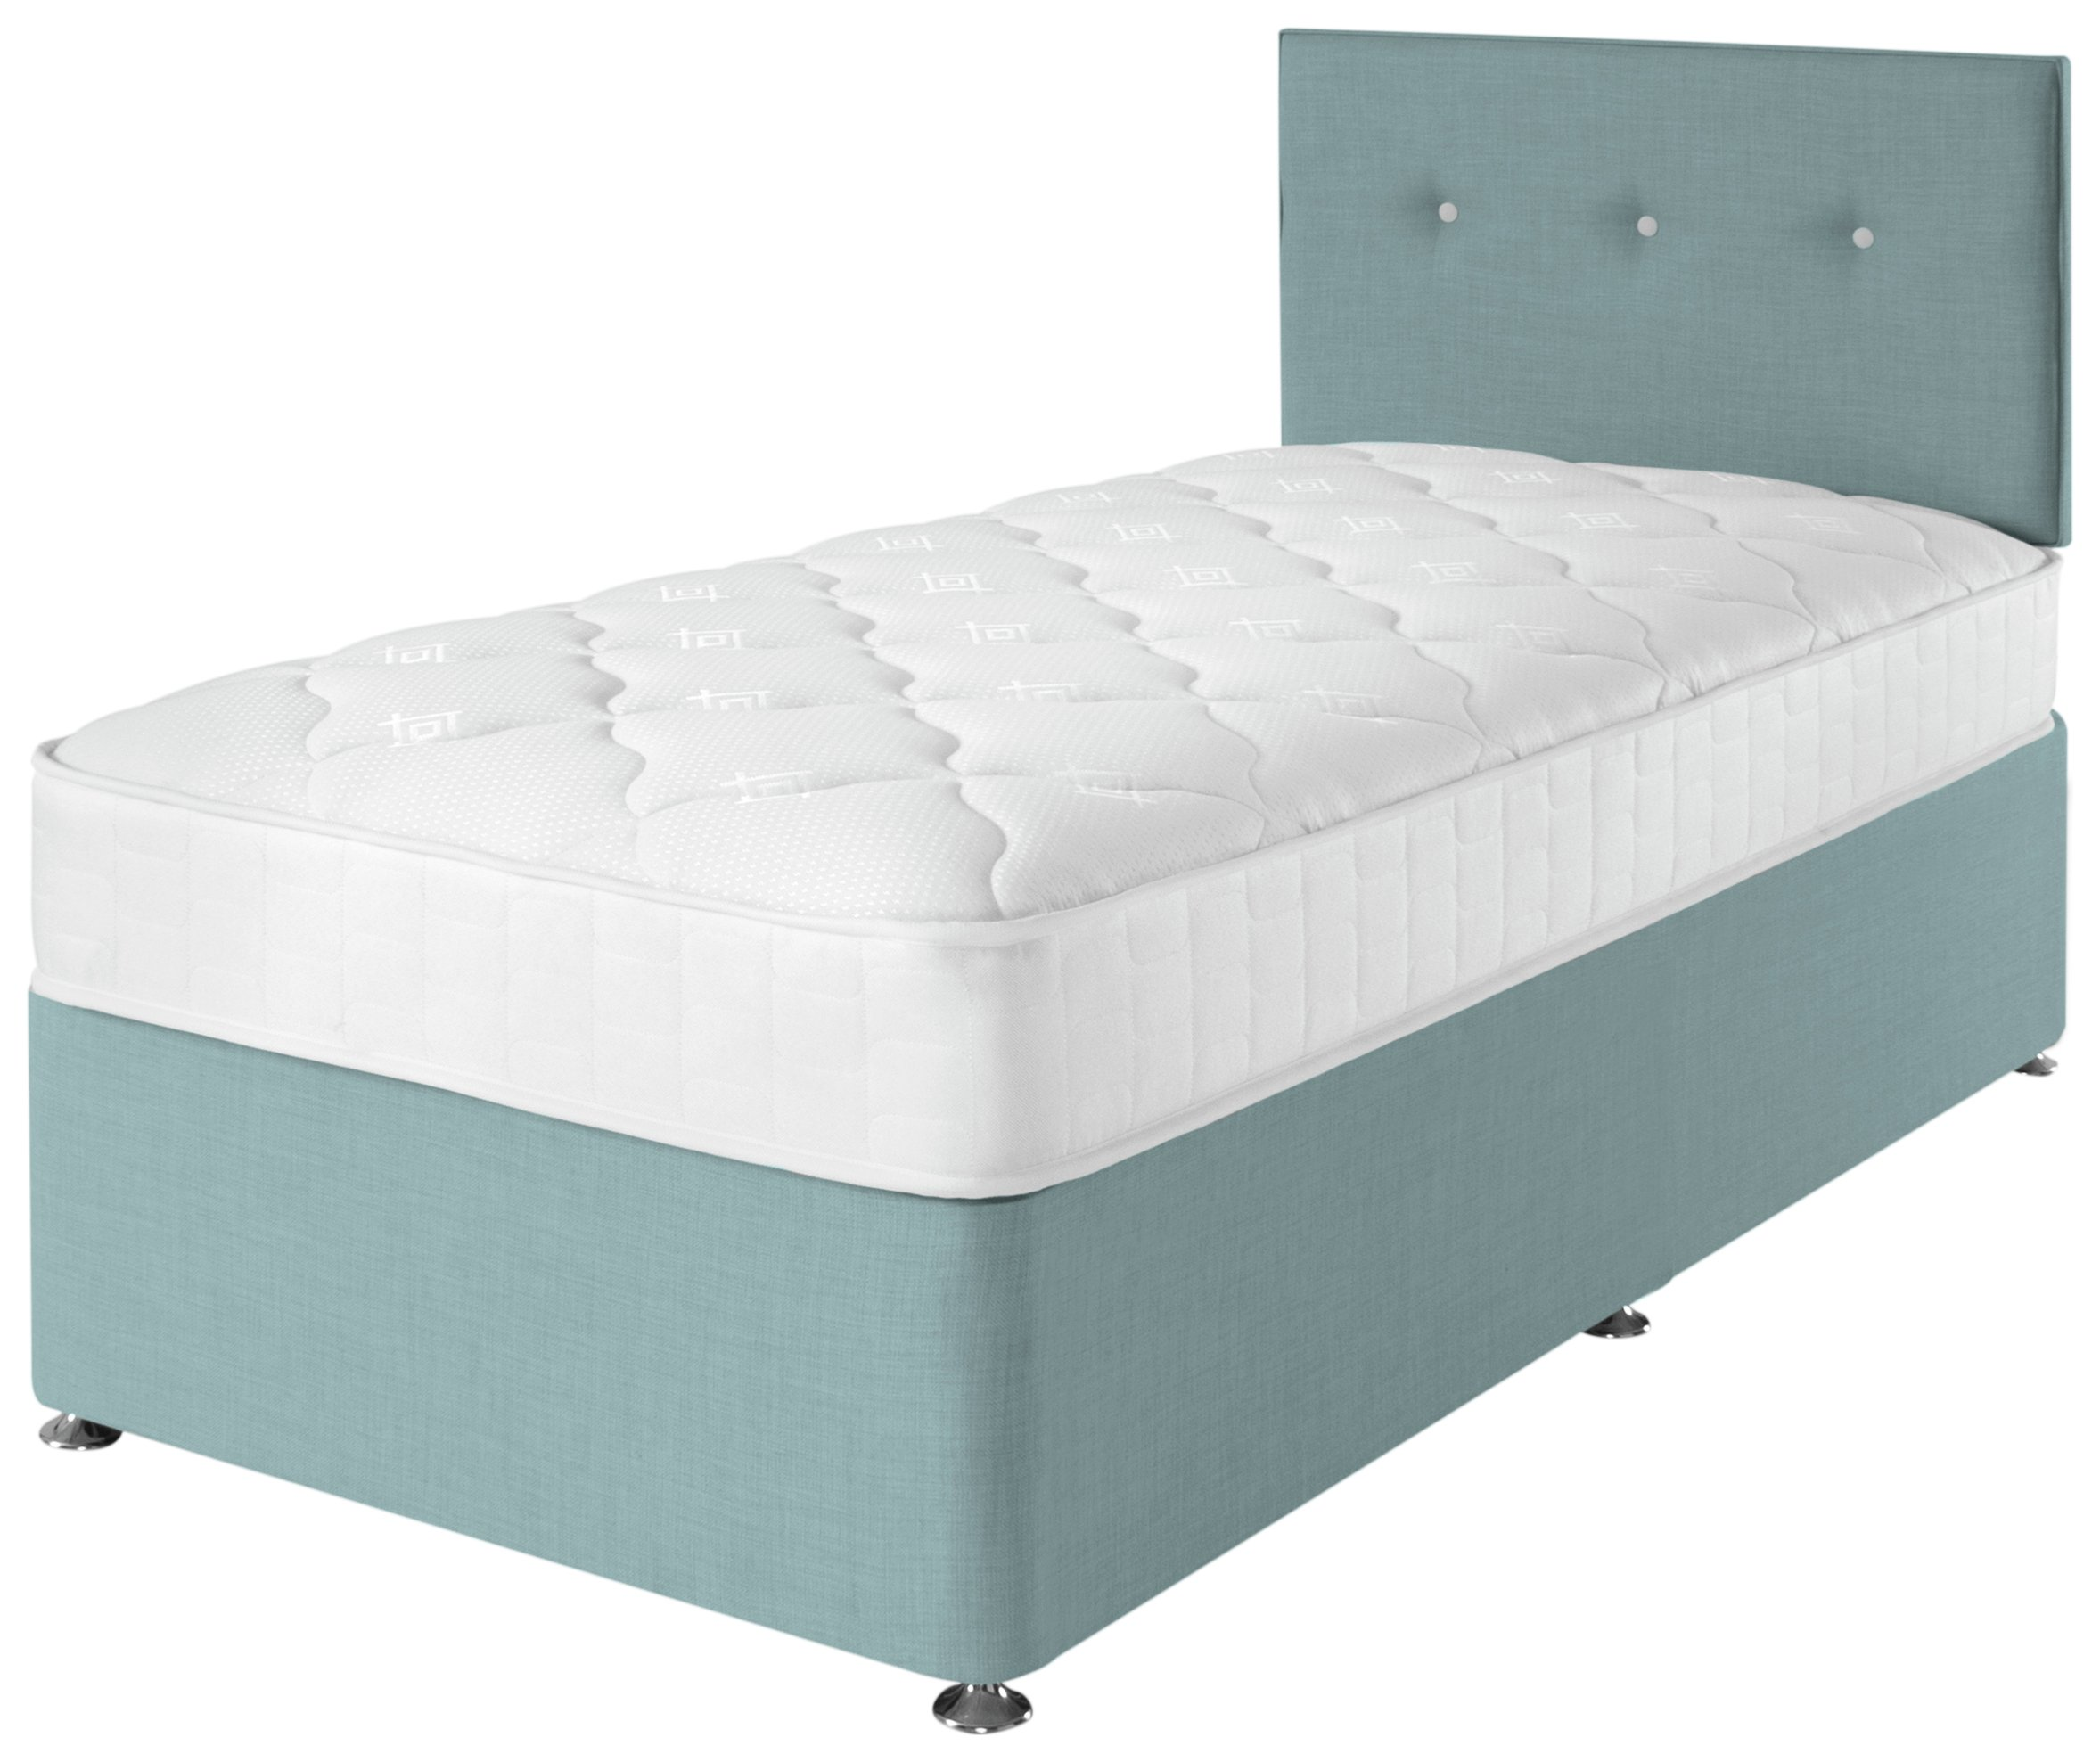 Airsprung Dalham Memory Blue Divan Bed - Single